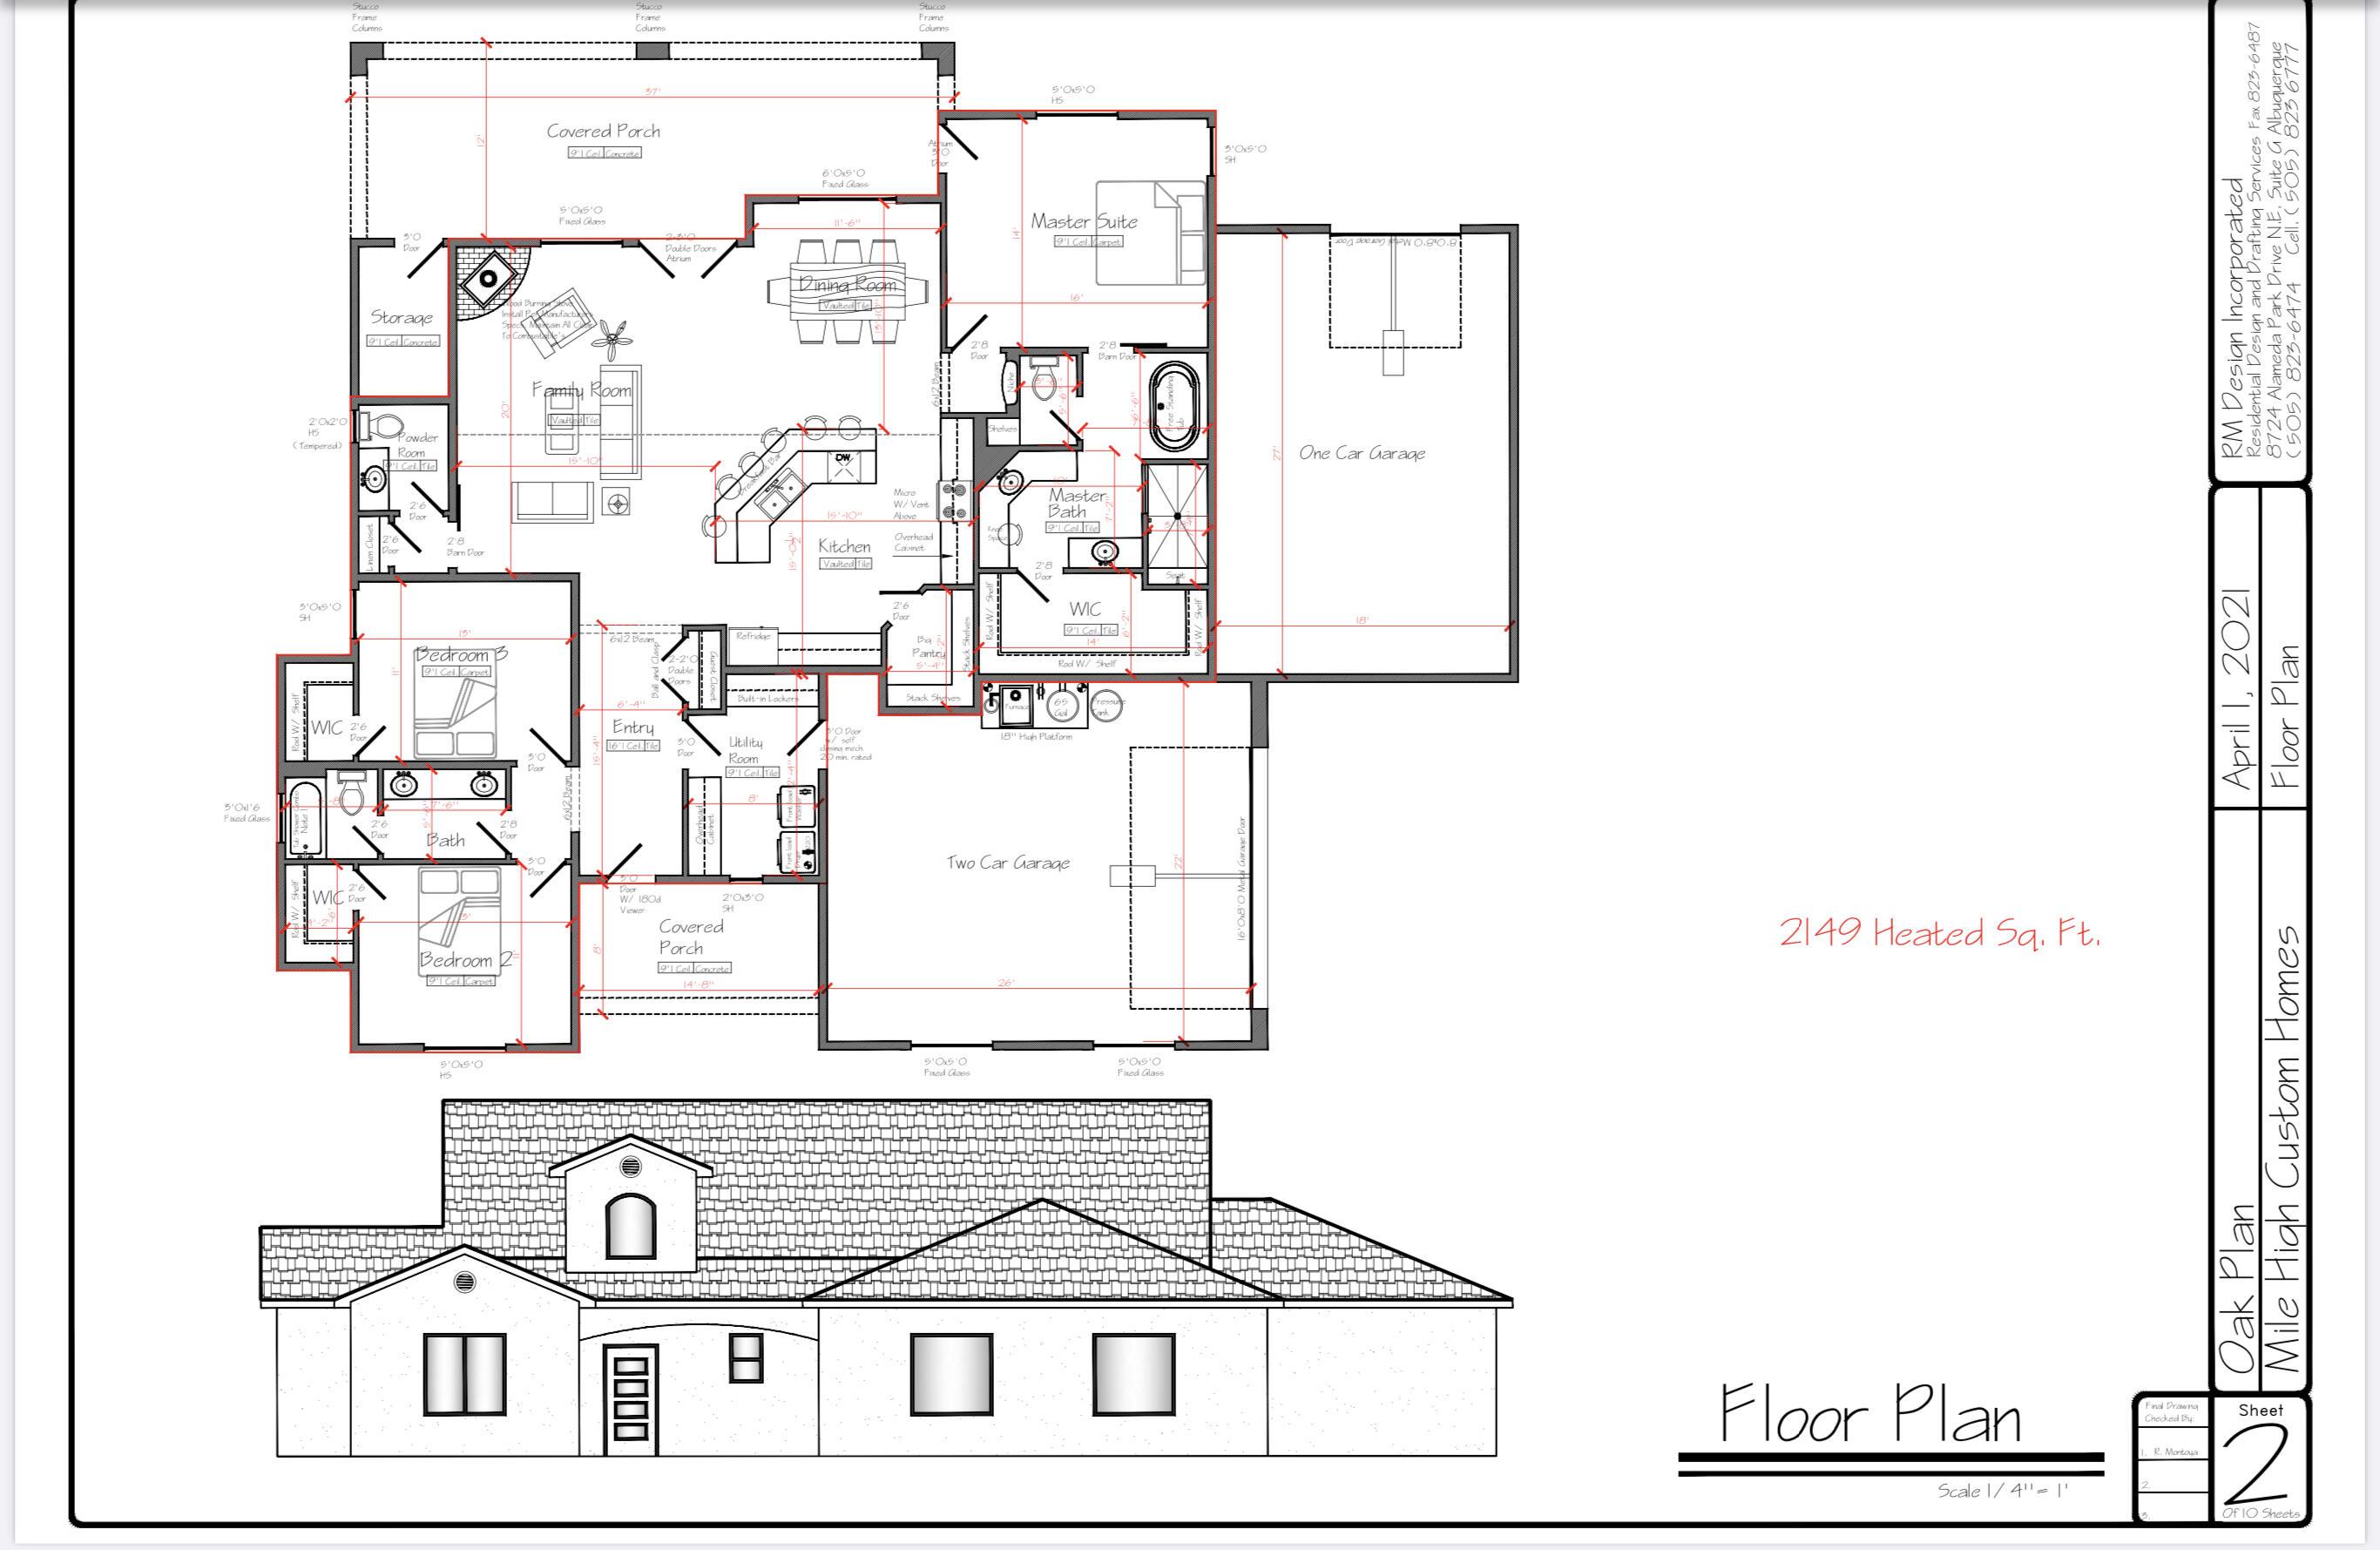 Custom built home Oak Floorplan. 3 Bedroom 2 1/2 bath with many custom features including Oversized 2/1 (3) car pull through garage.